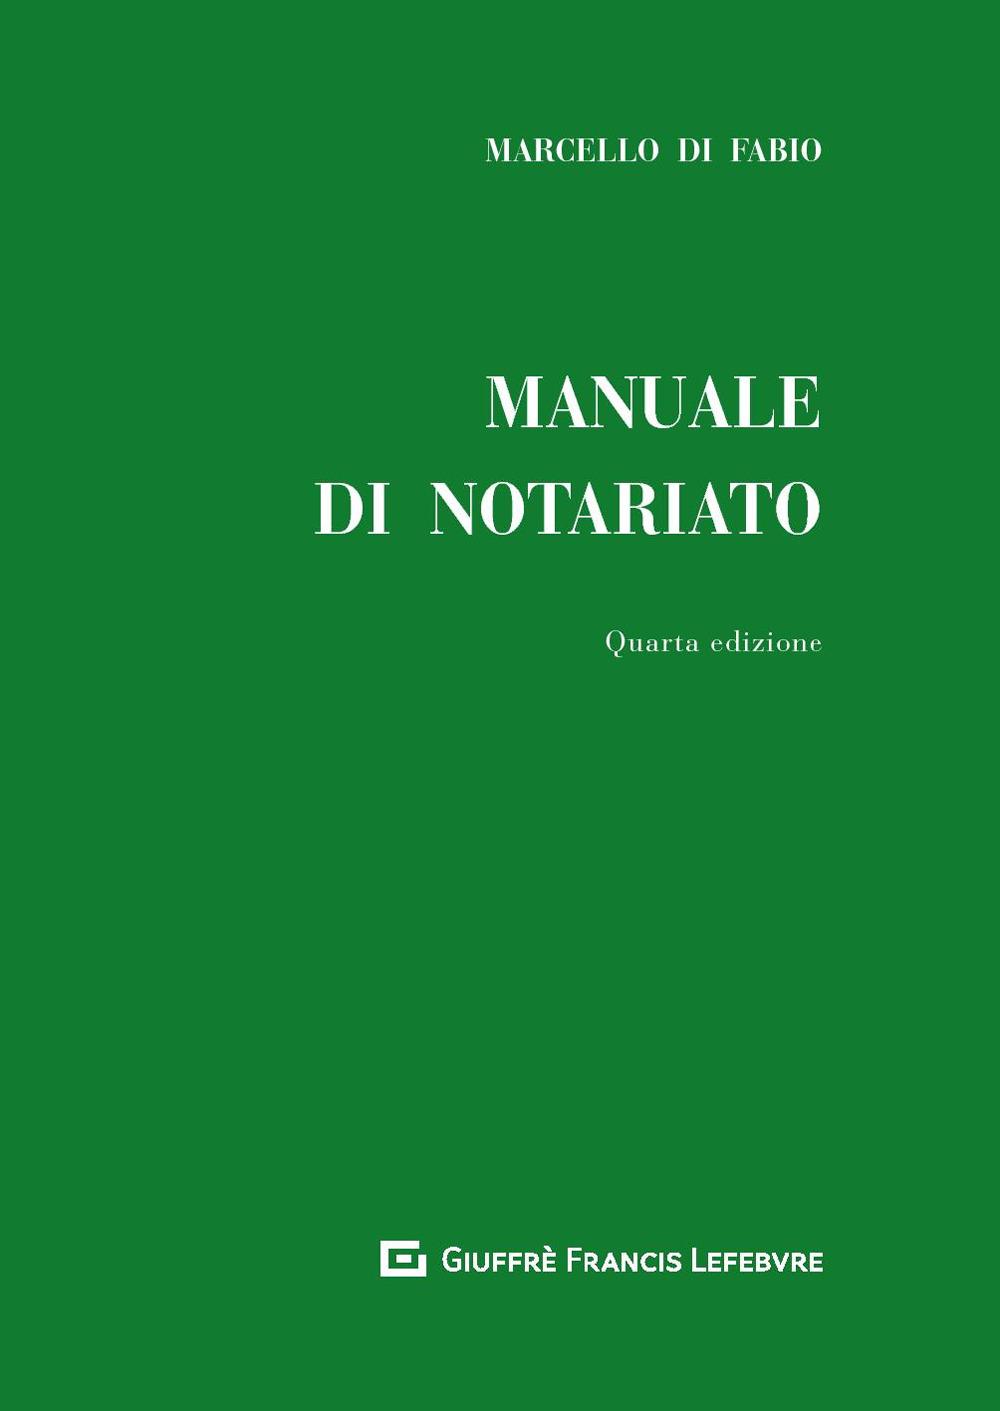 Image of Manuale di notariato